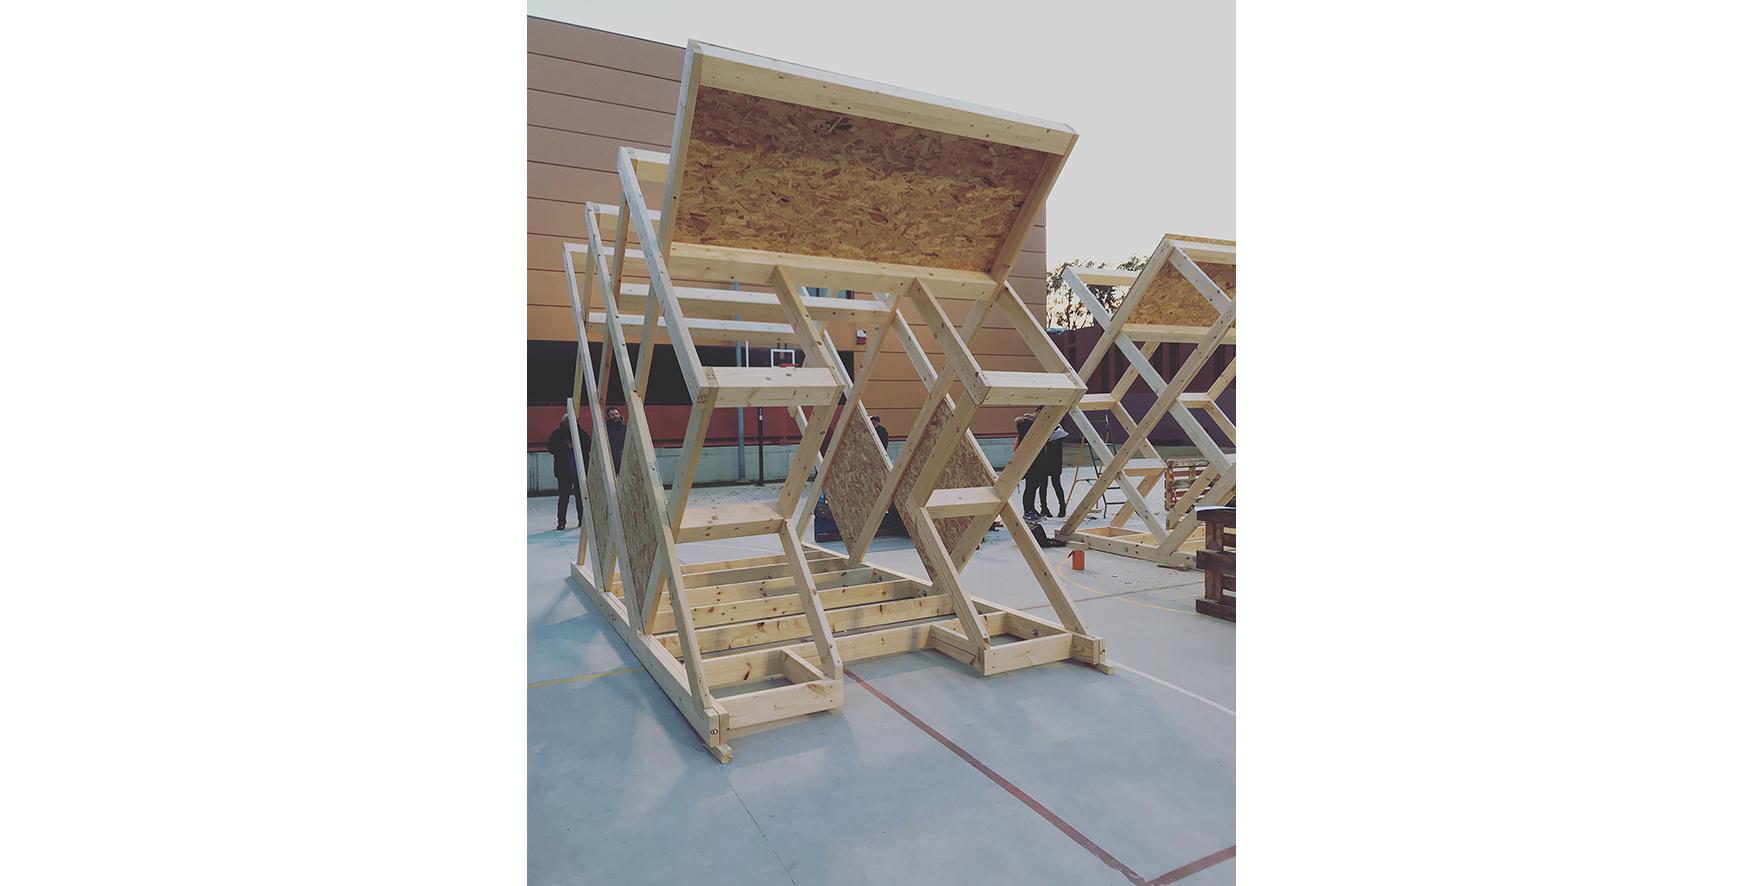 Estructures de fusta